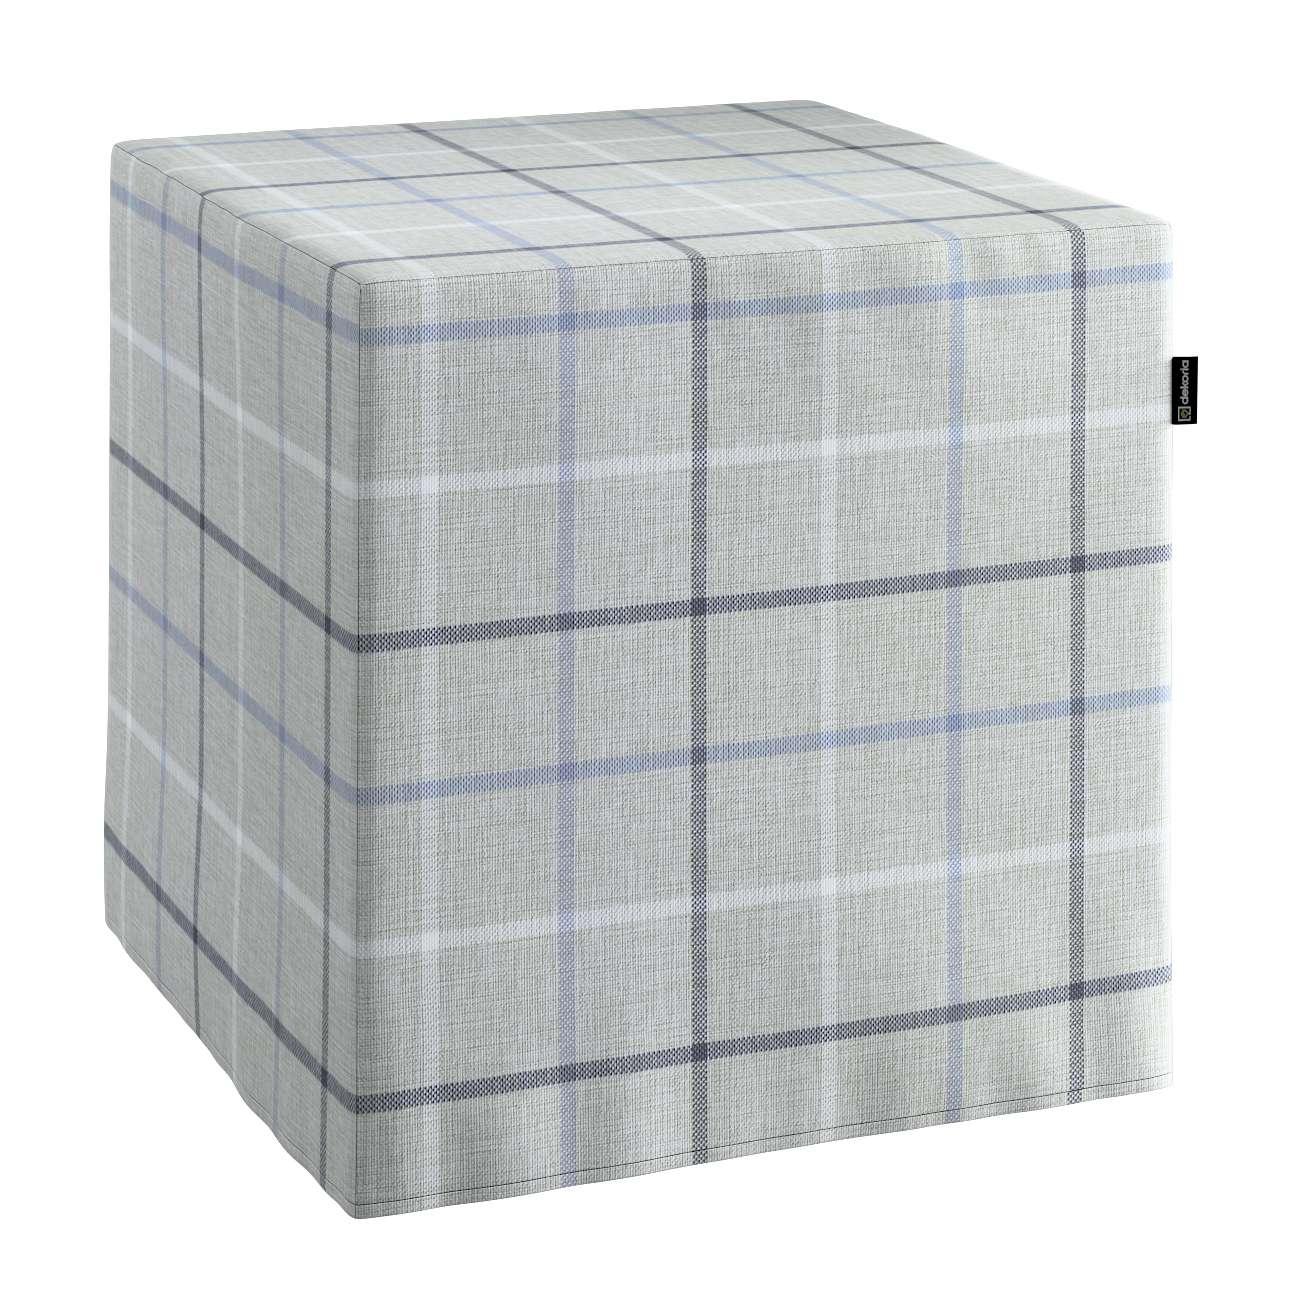 Pufa kostka w kolekcji Edinburgh, tkanina: 703-18